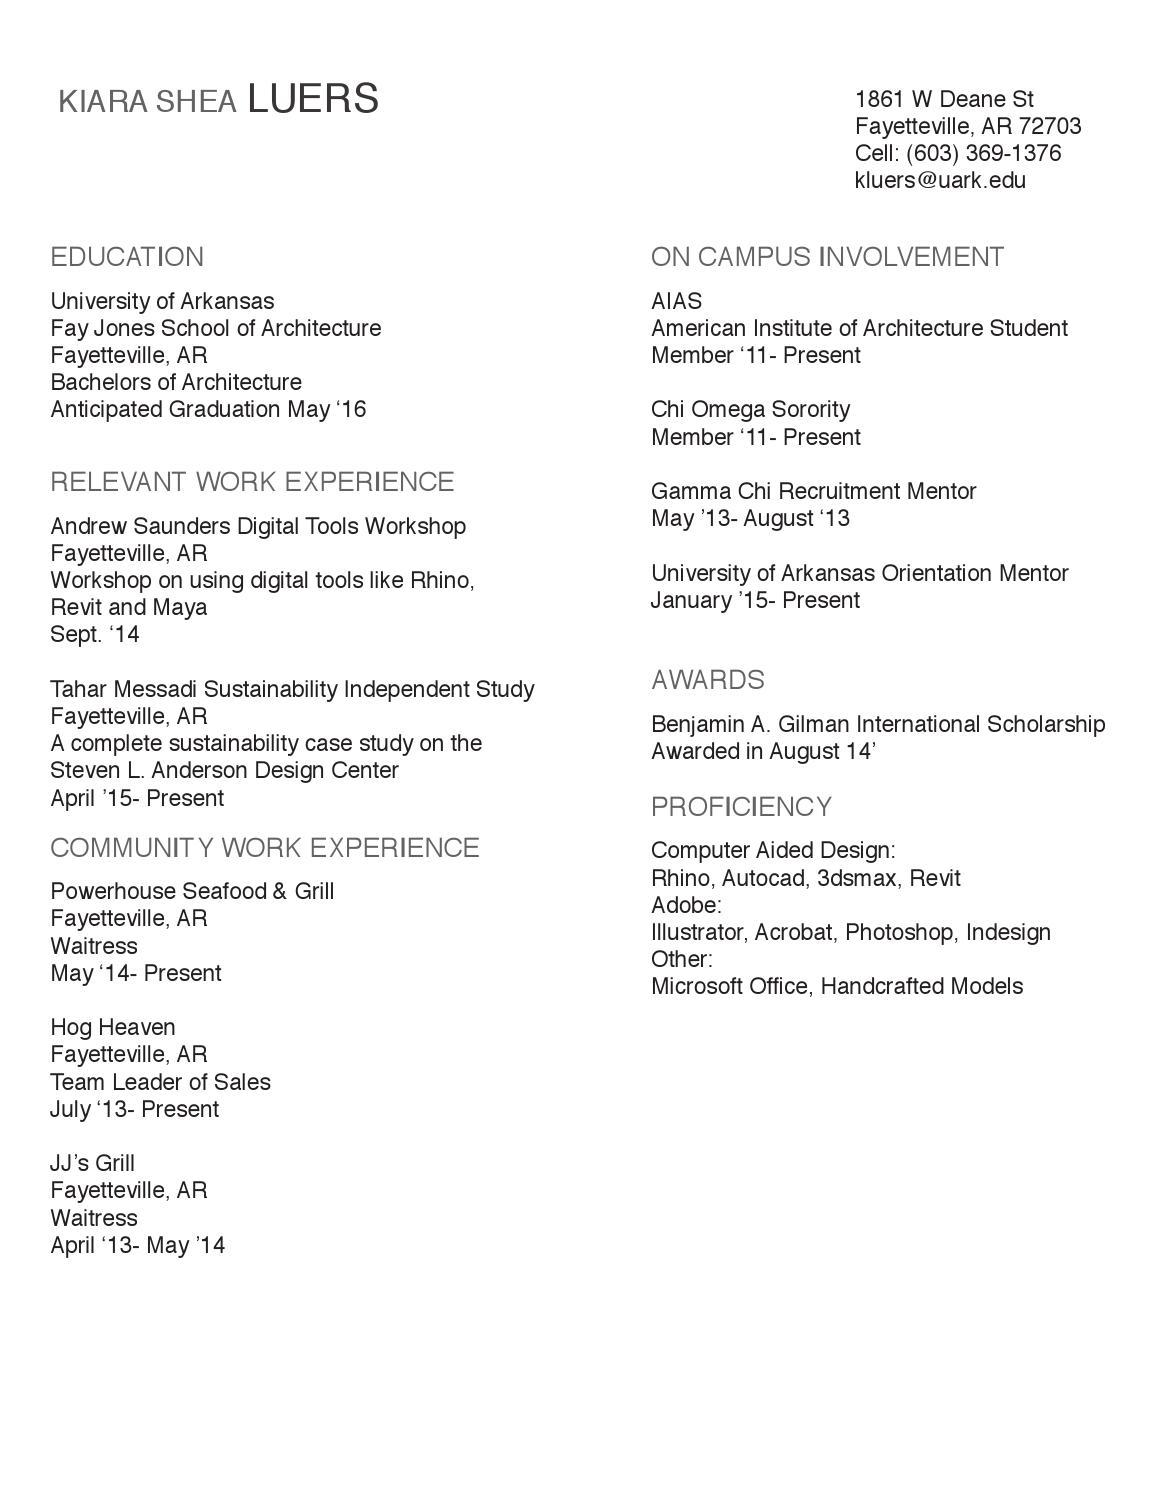 Resume Center Uark. u of a cdc uark cdc twitter. resume ann kyle ...